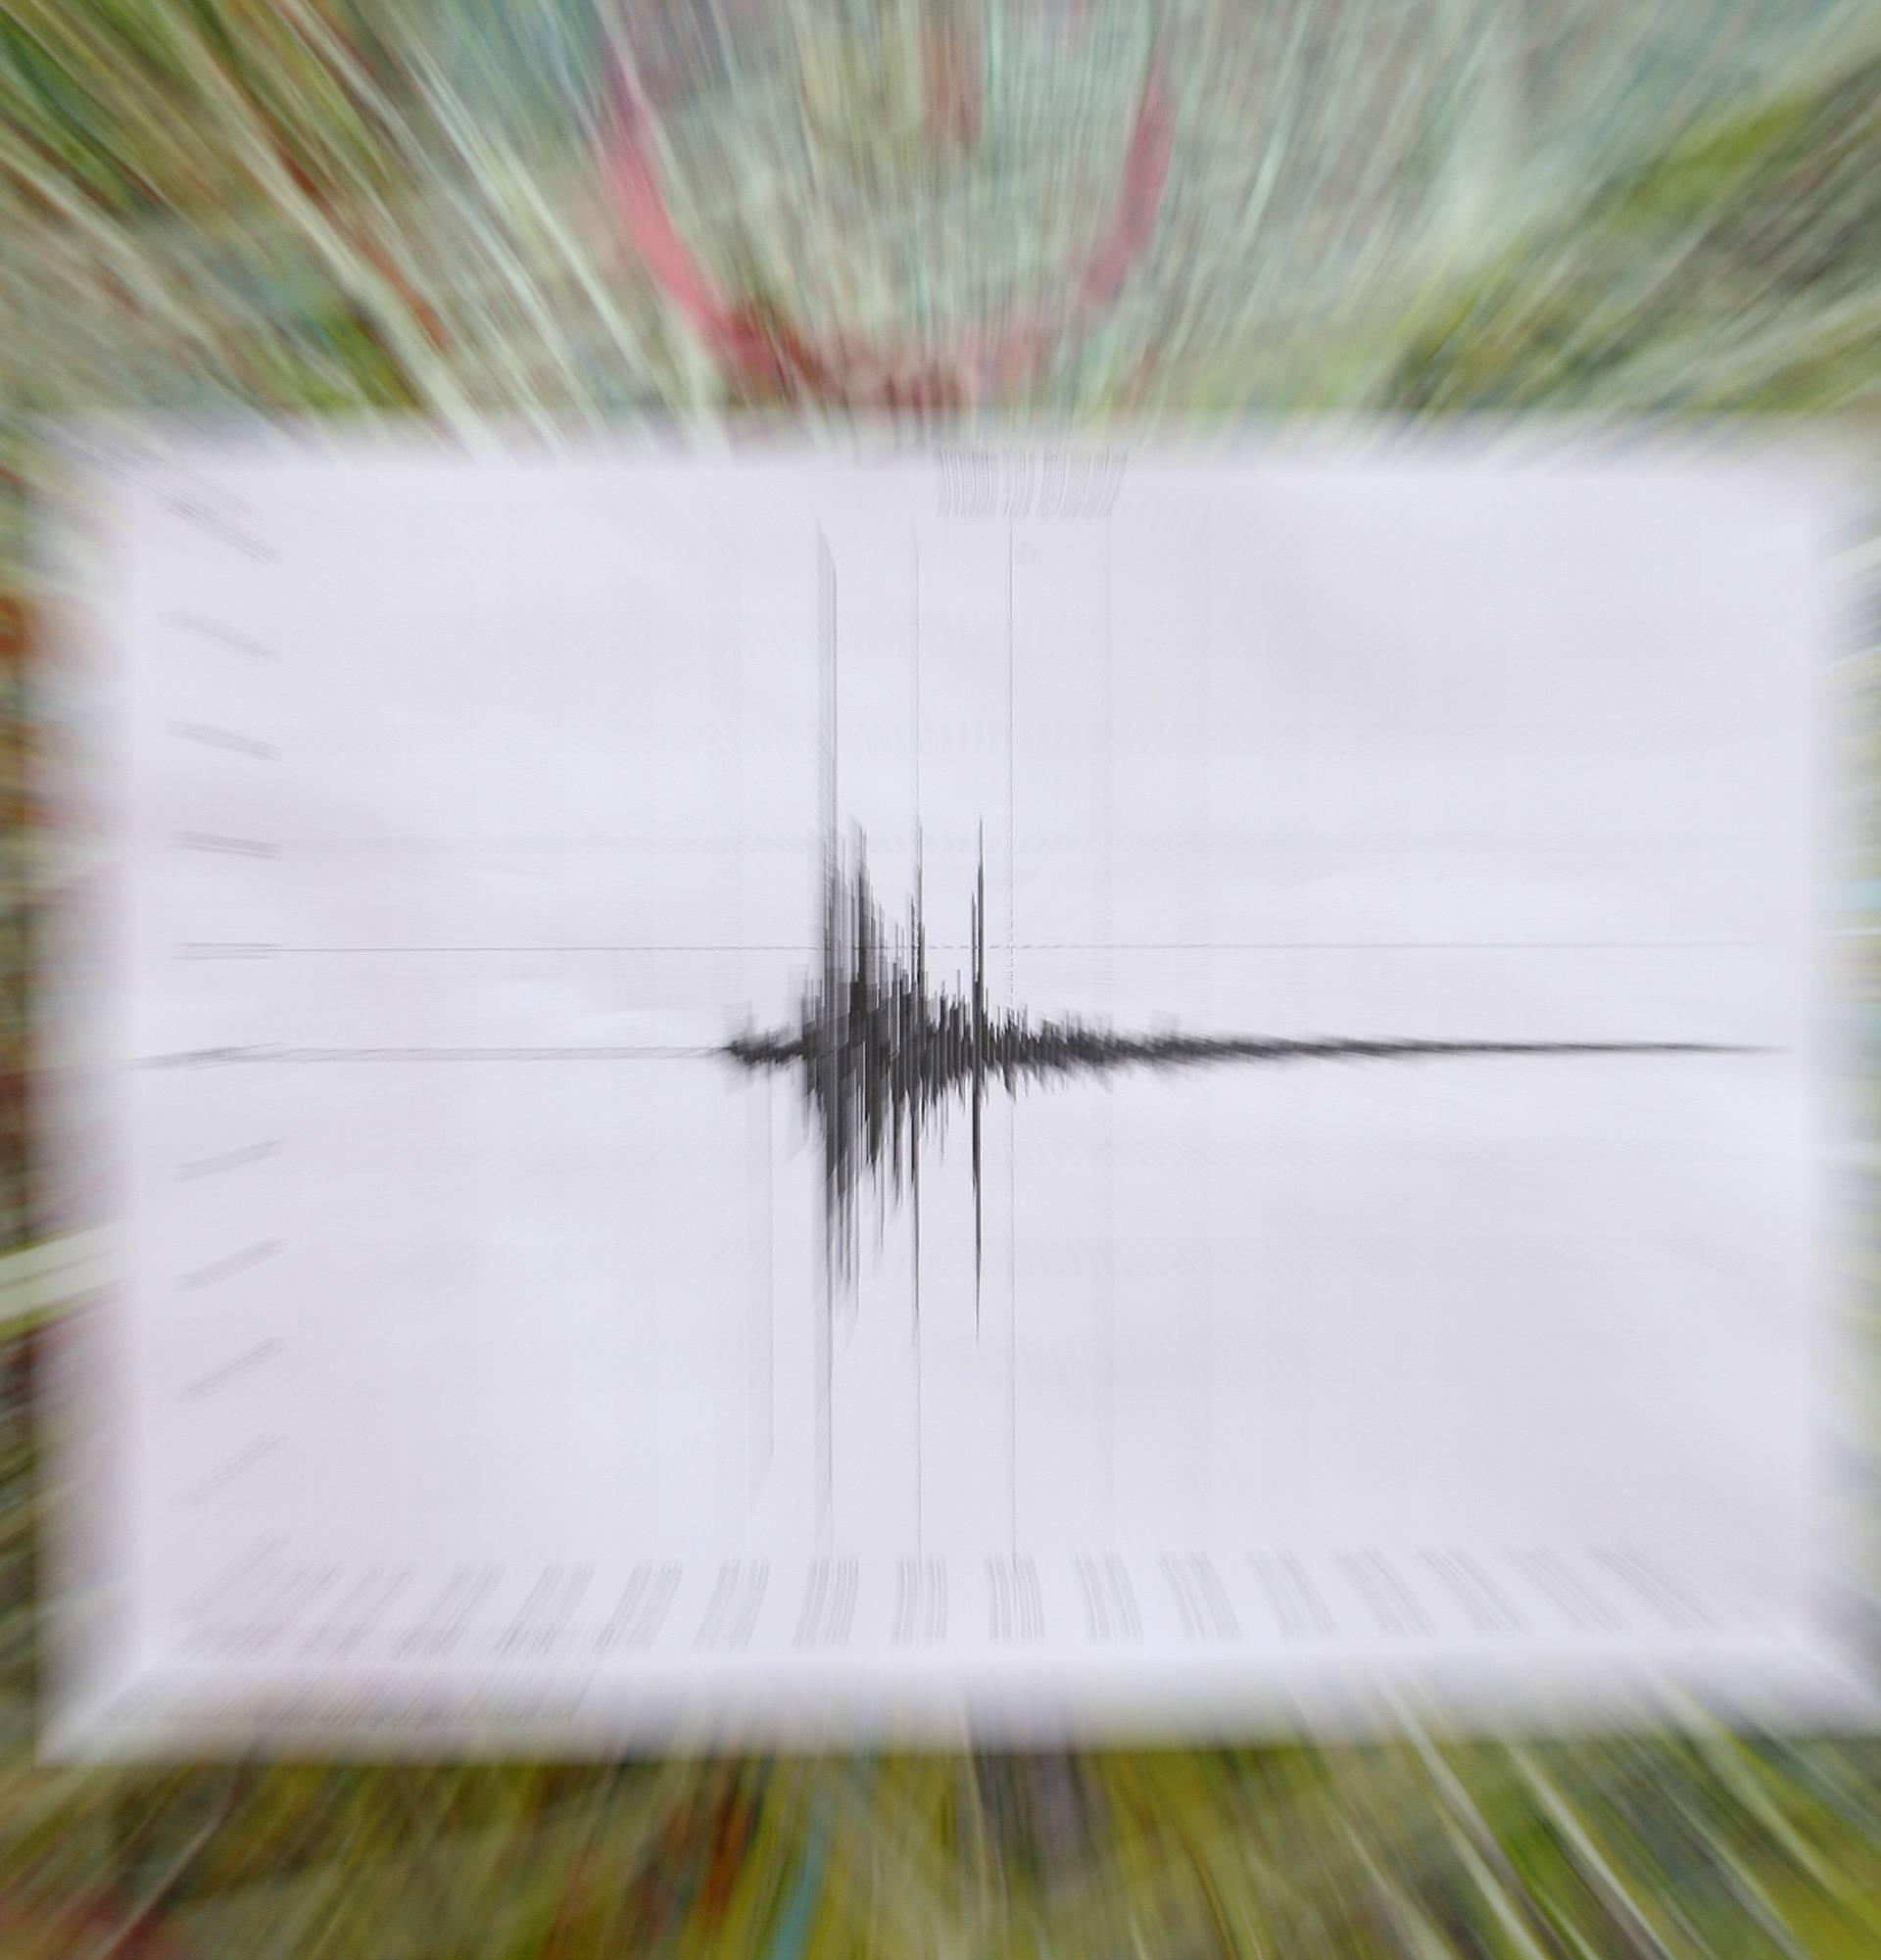 Indoneziju zatresao potres, nema upozorenja za tsunami